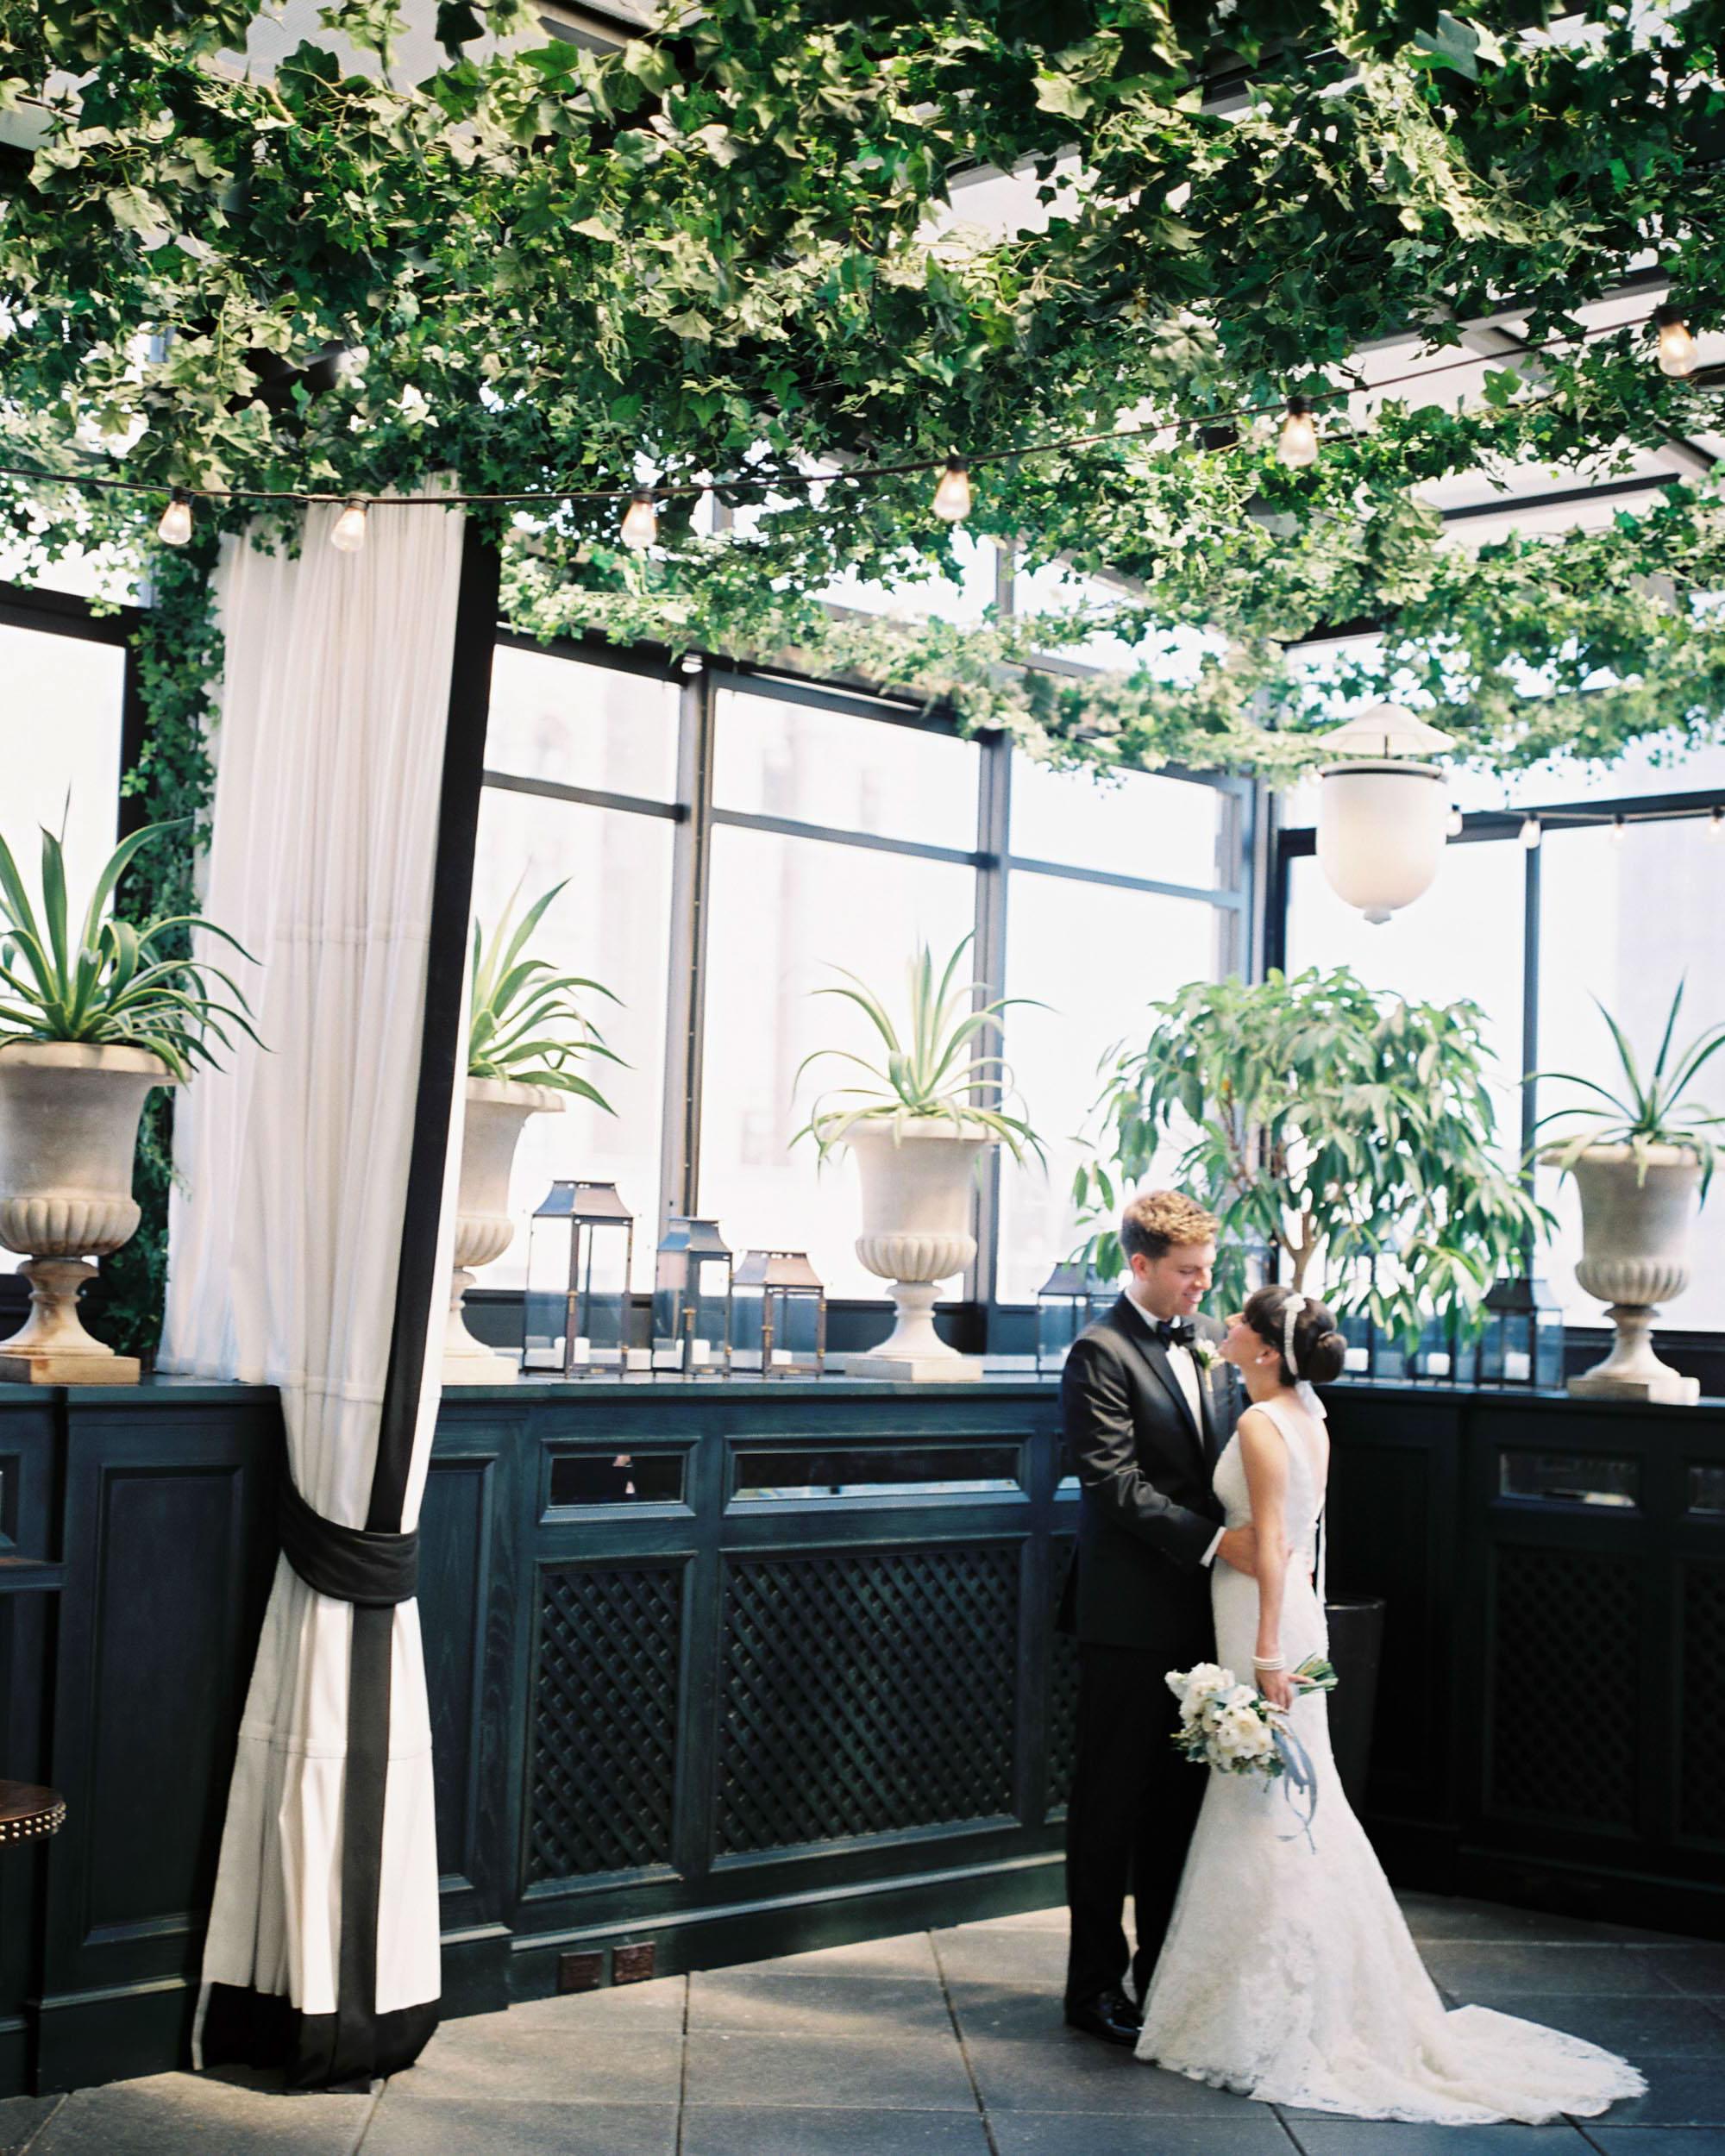 Gramercy Park Hotel Wedding Photographer 0093 - Gramercy Park Hotel